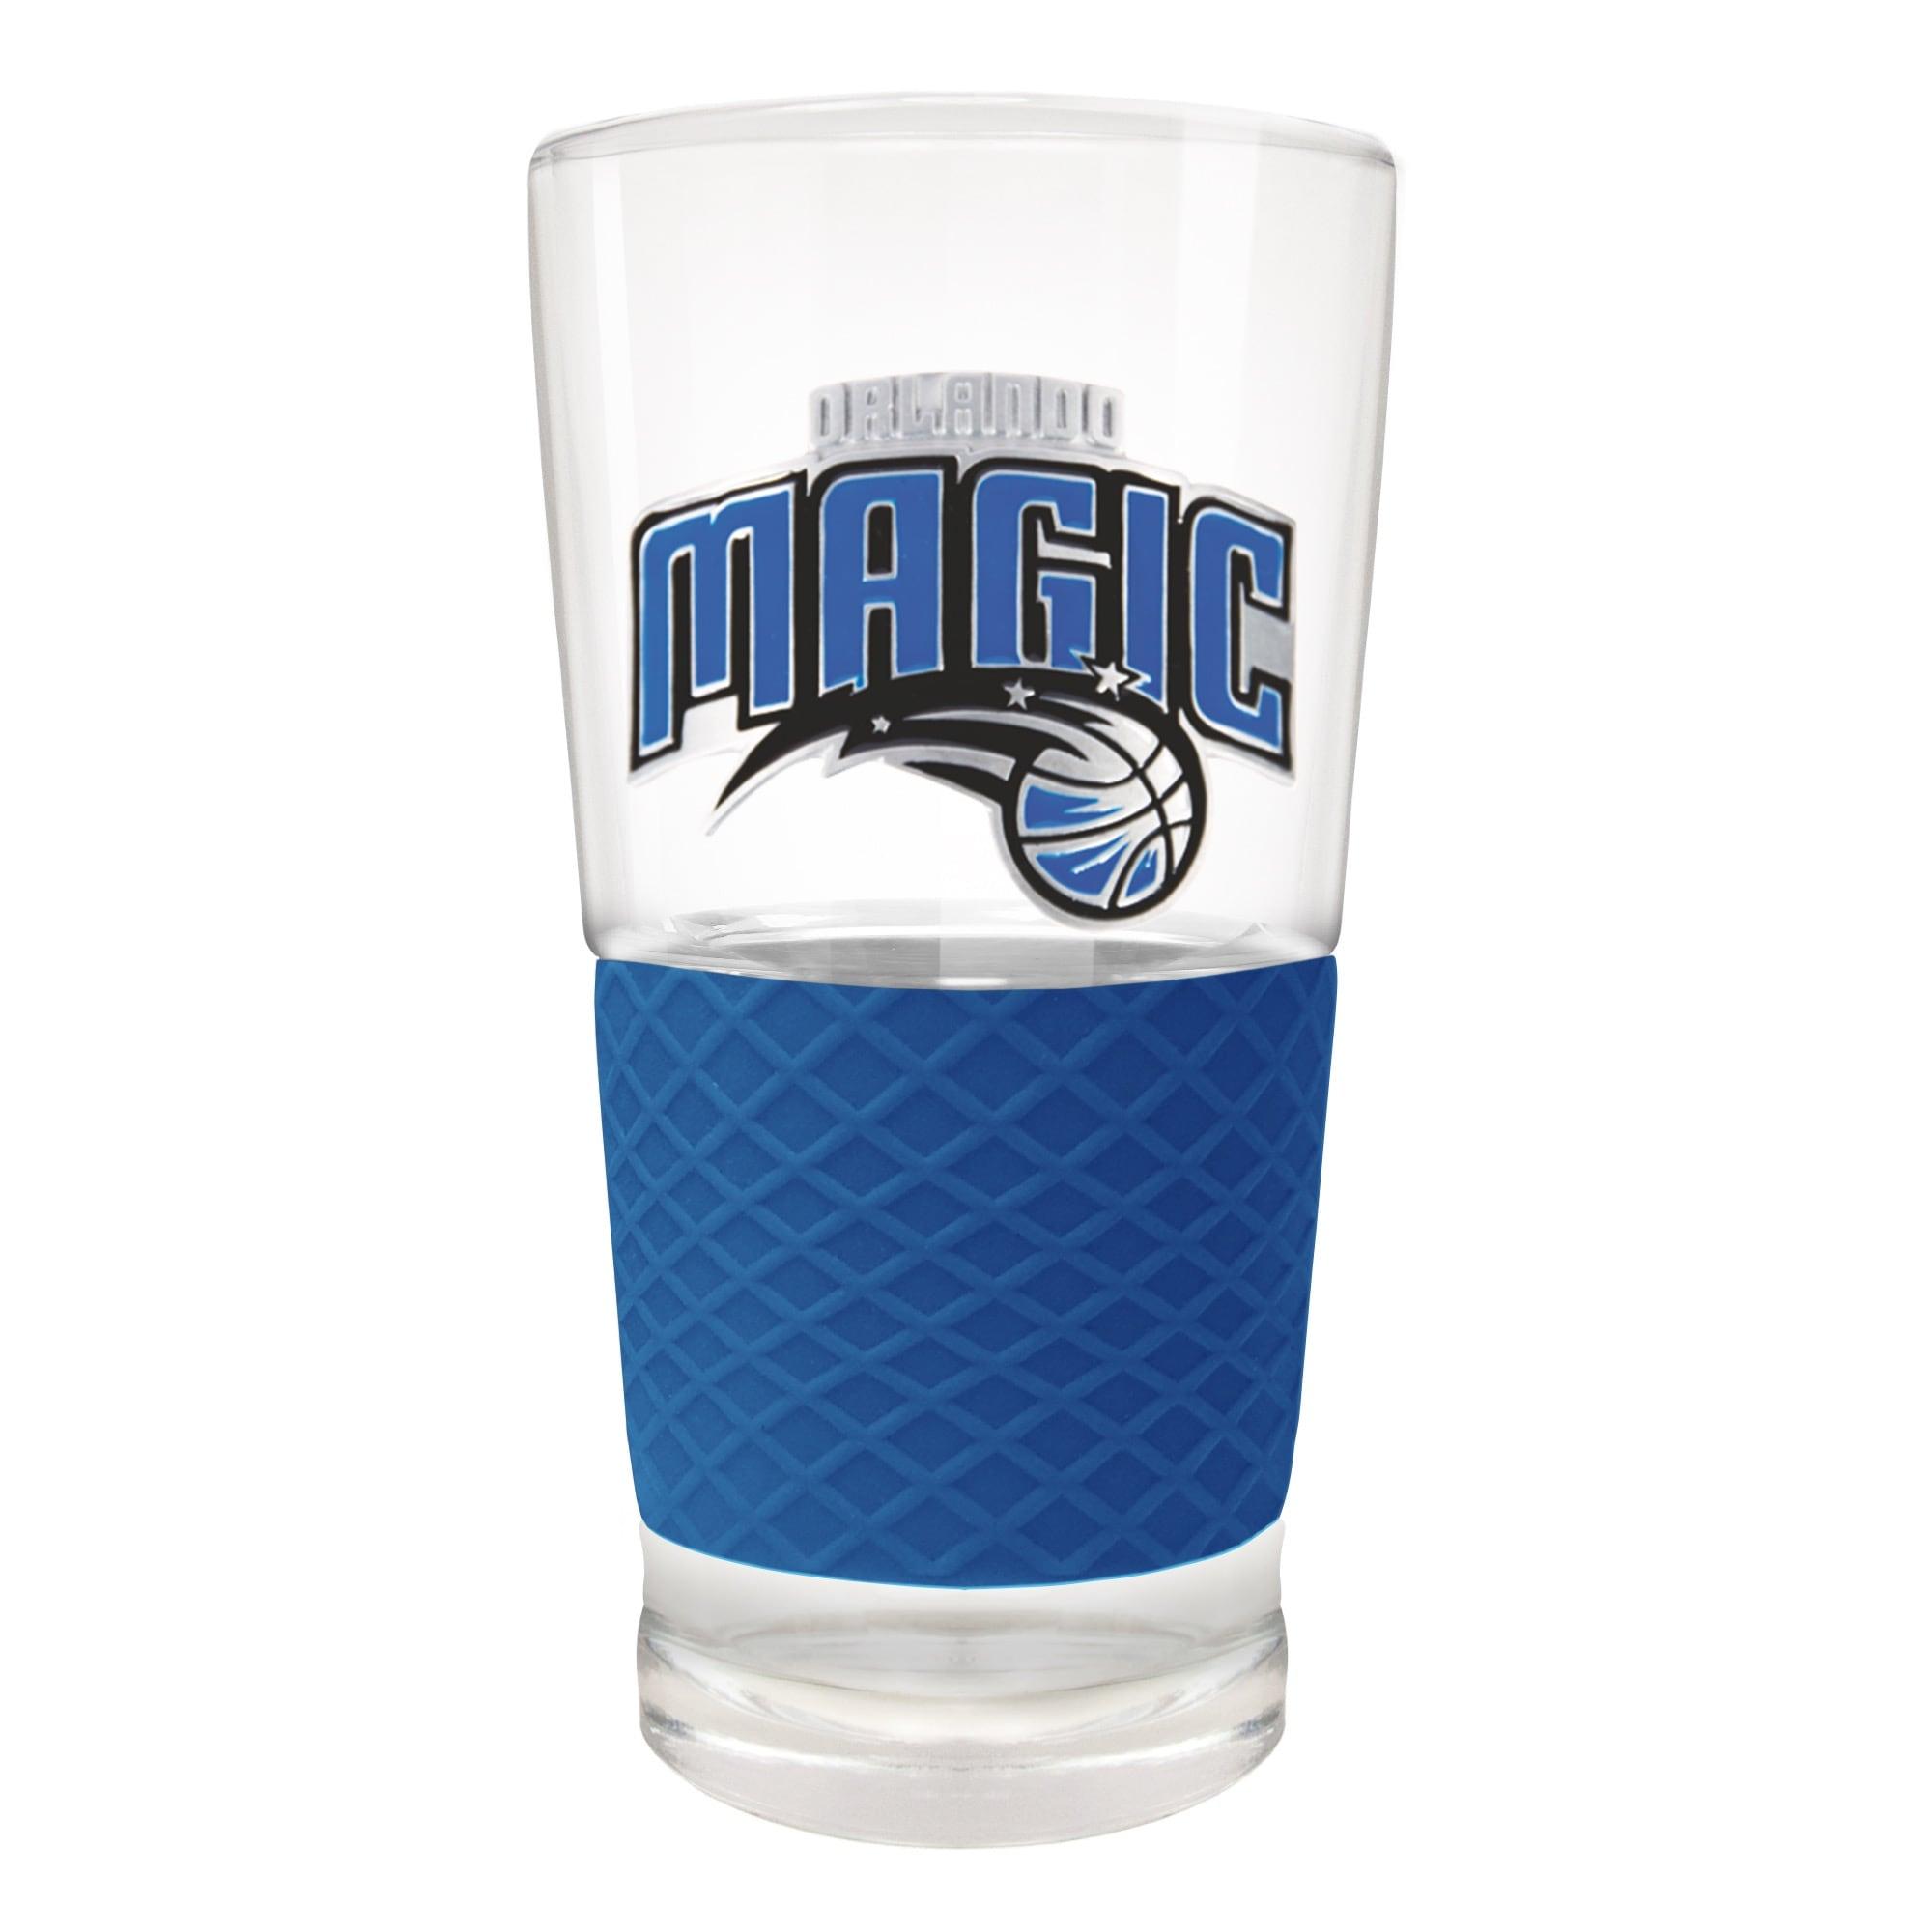 Orlando Magic 22oz. Pilsner Glass with Silicone Grip